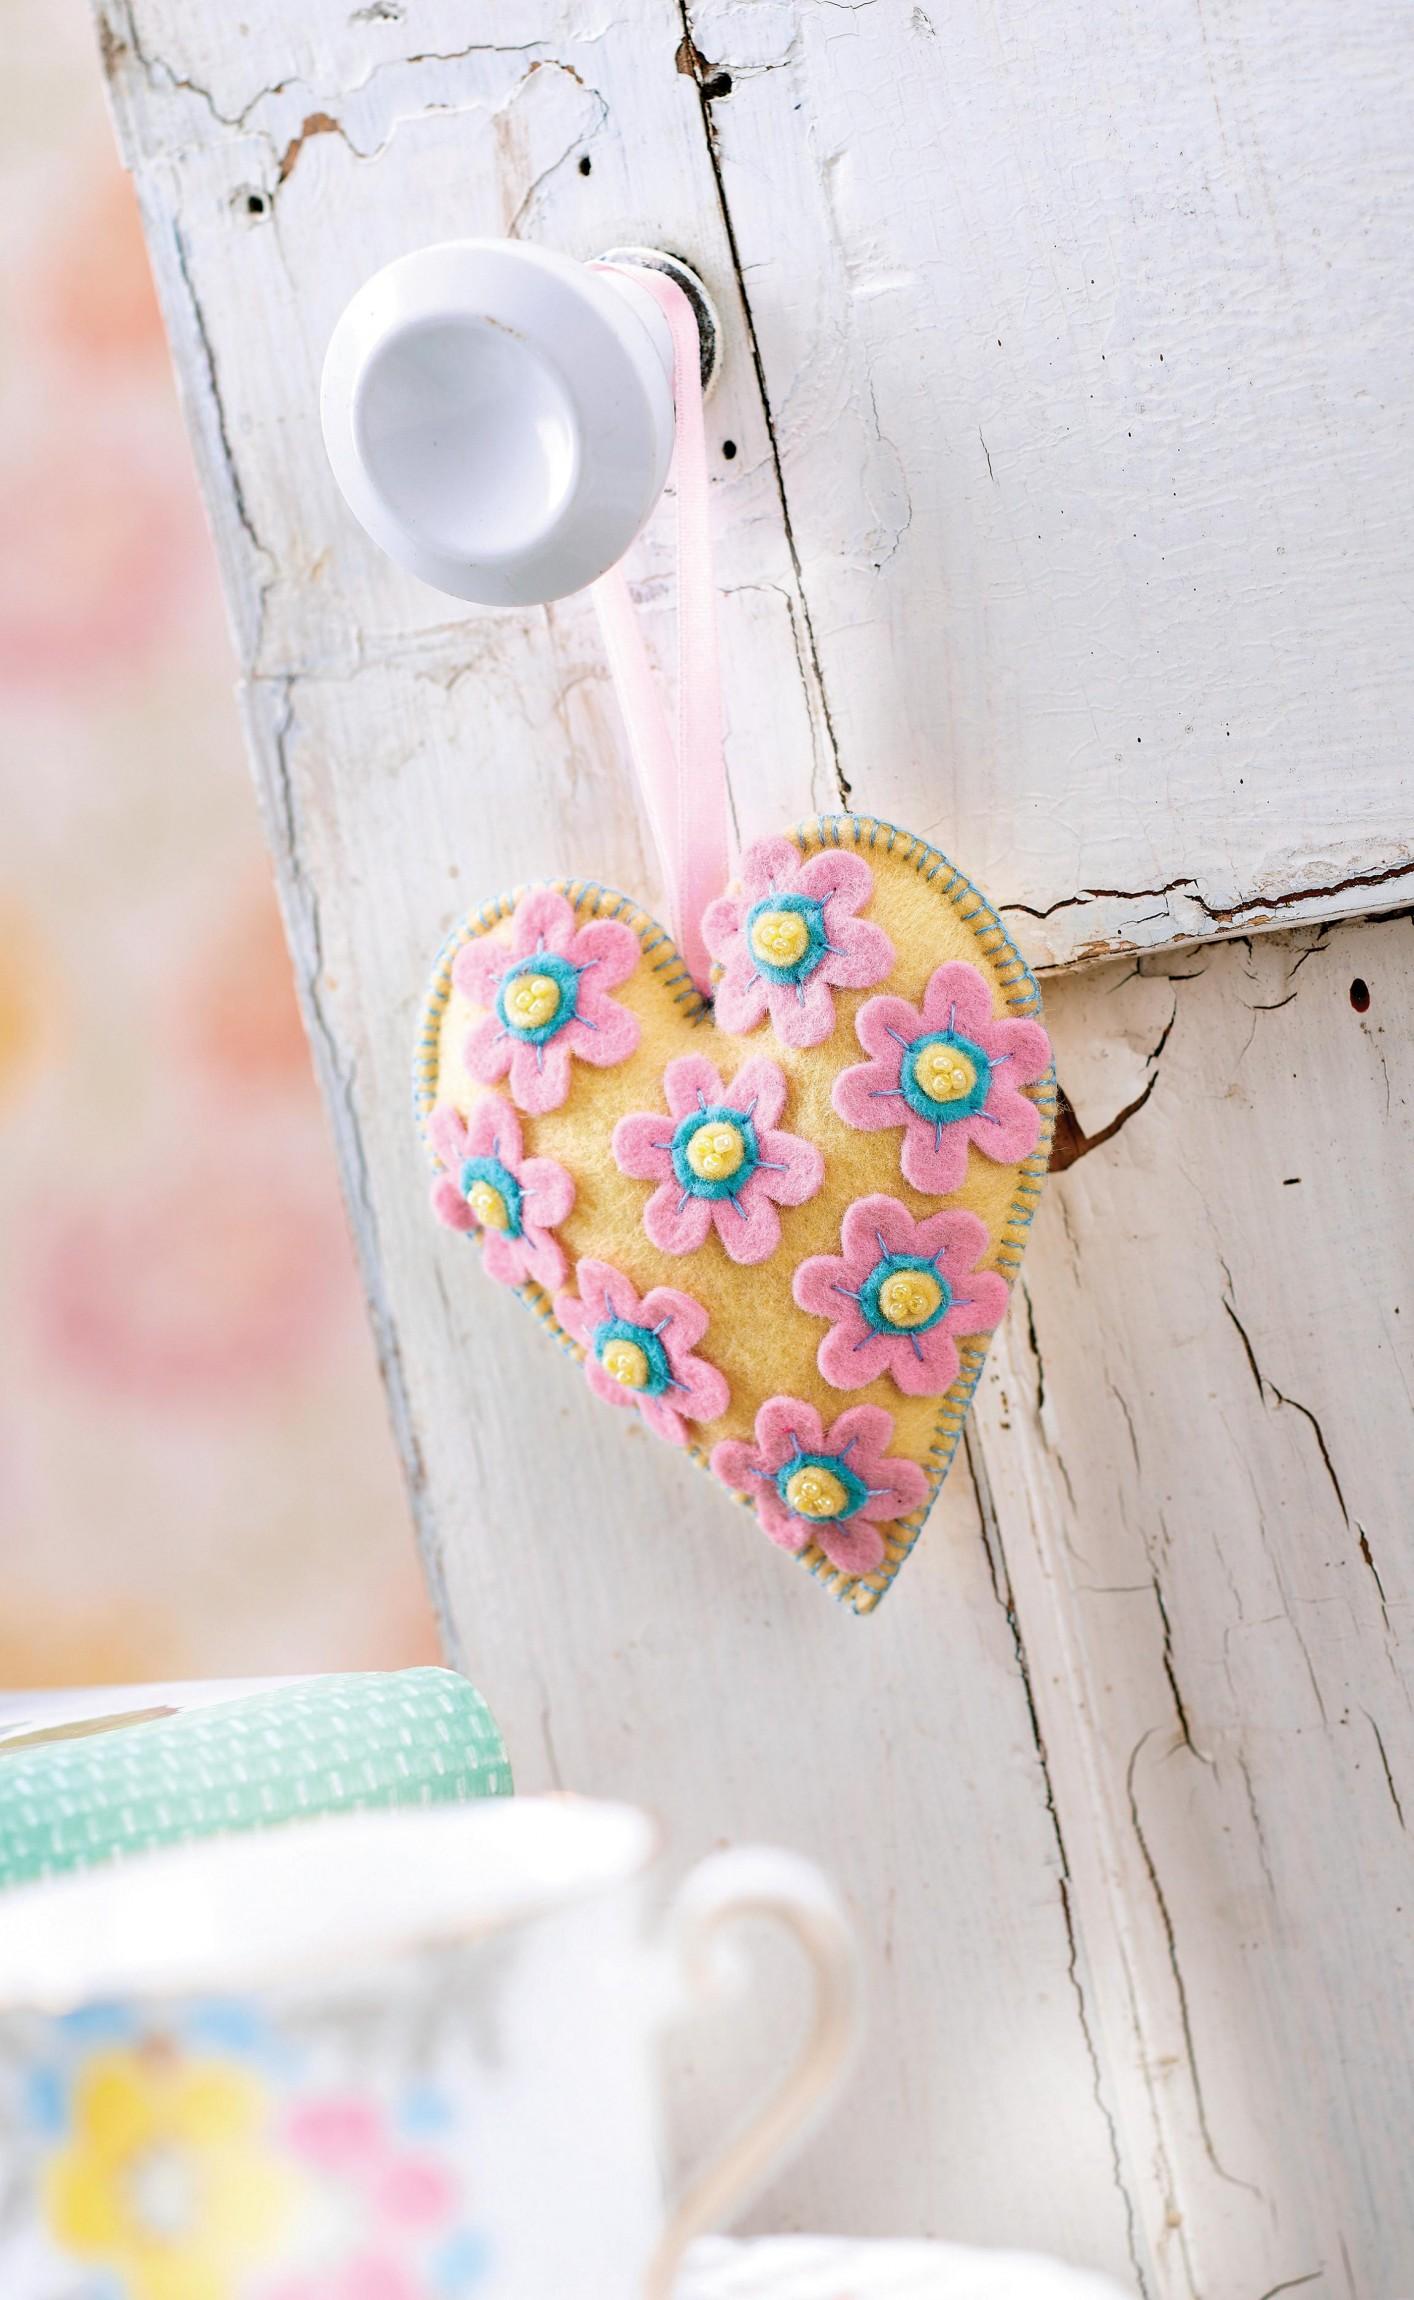 Padded Heart Felt Decoration Free Sewing Patterns Sew